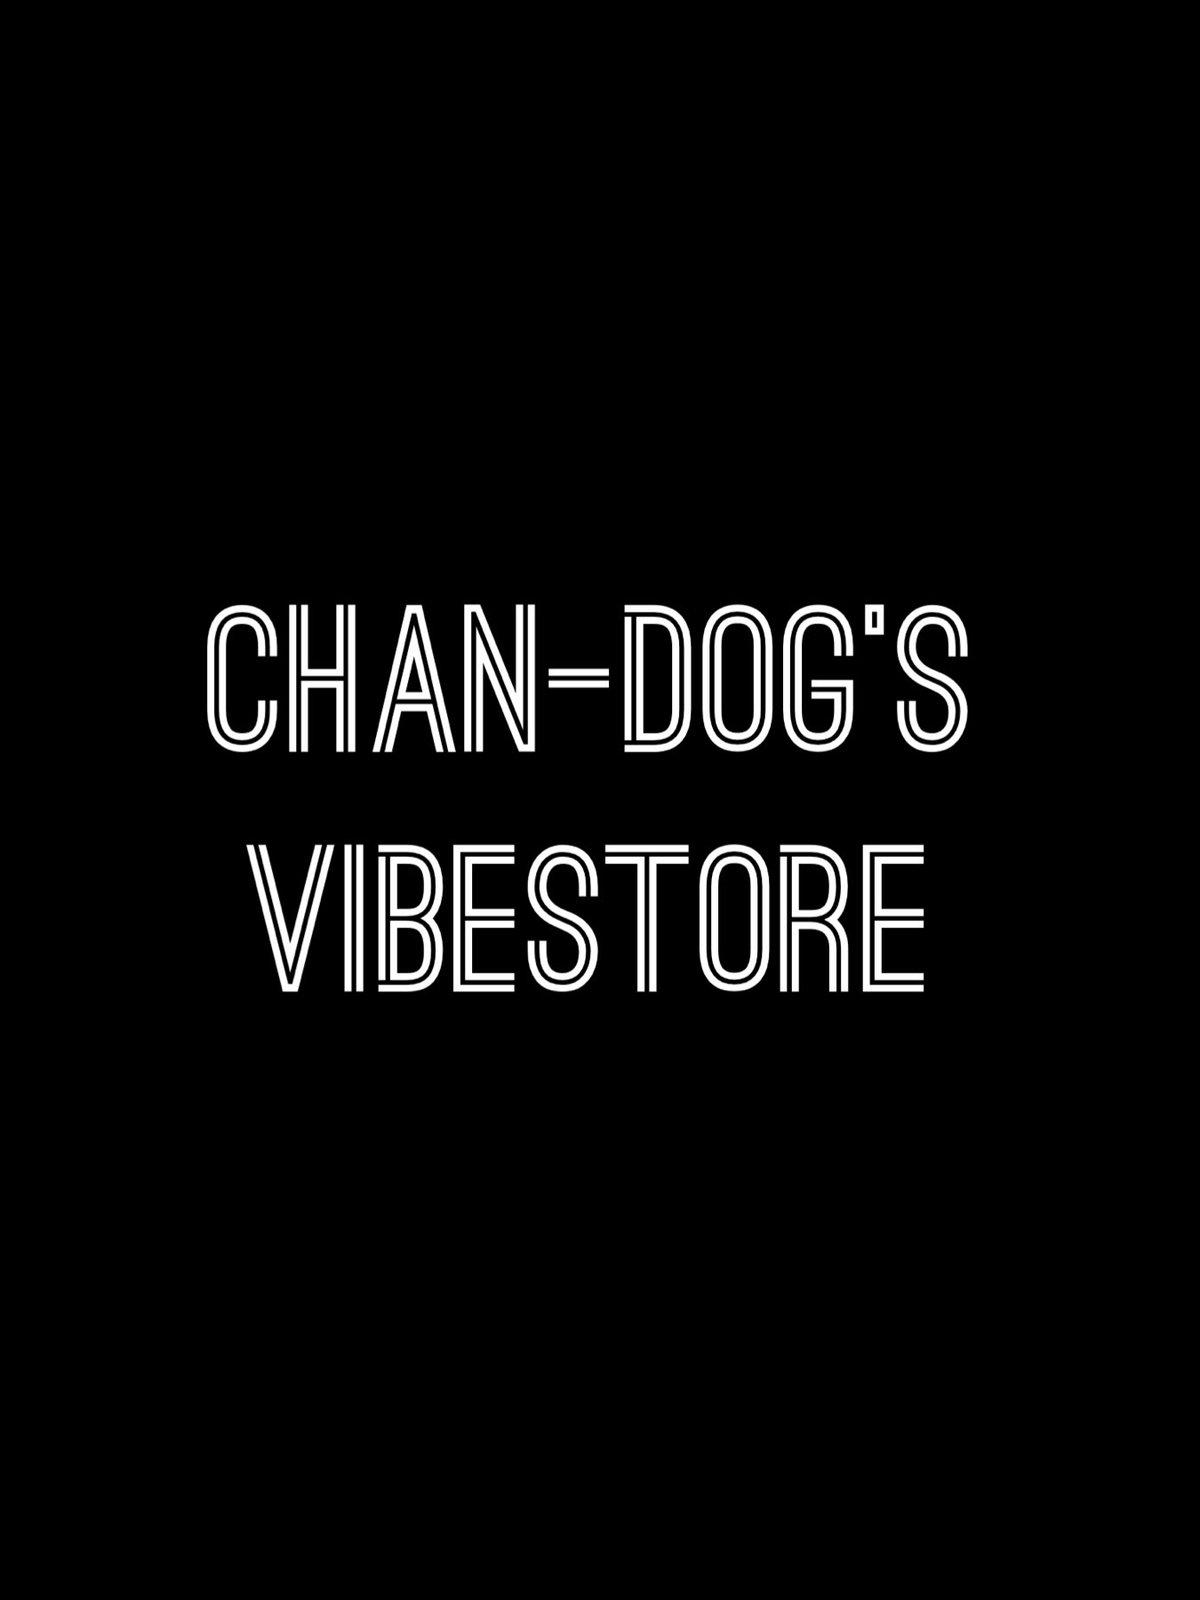 Chan-Dog's VibeStore